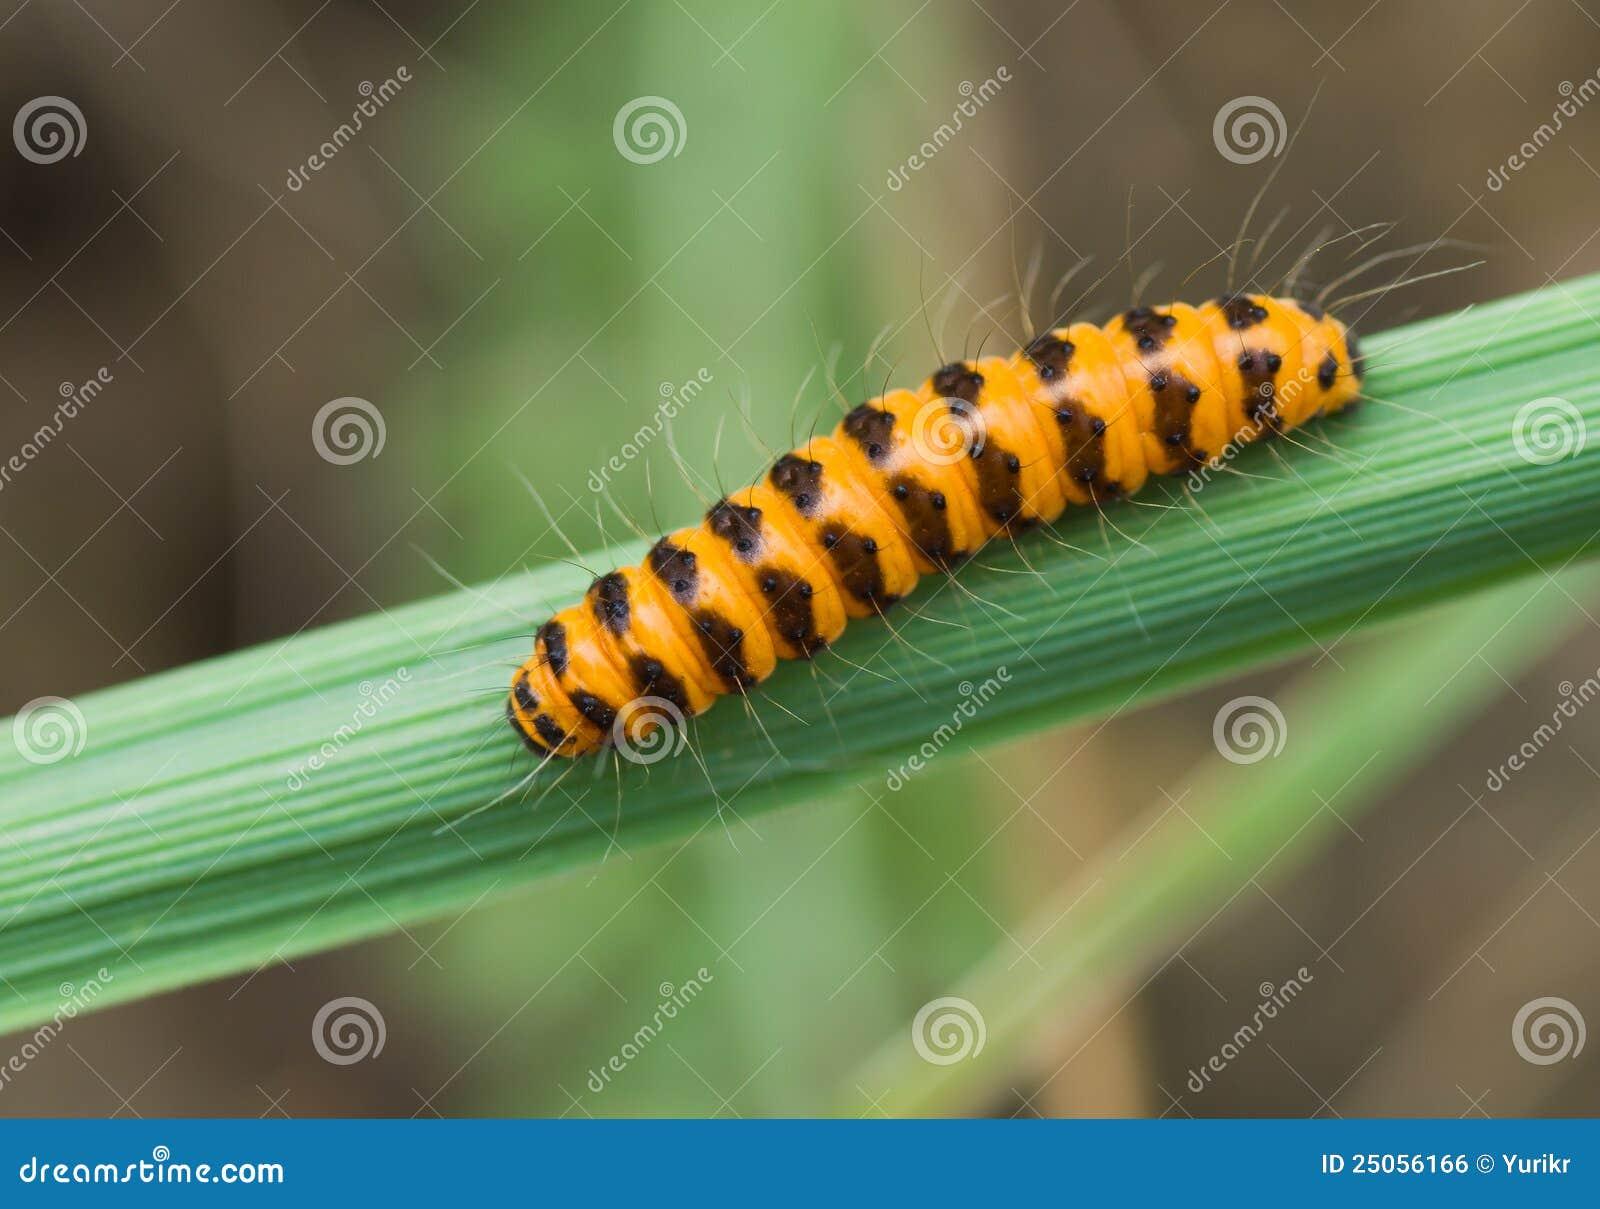 Green caterpillar orange strip blackman nude